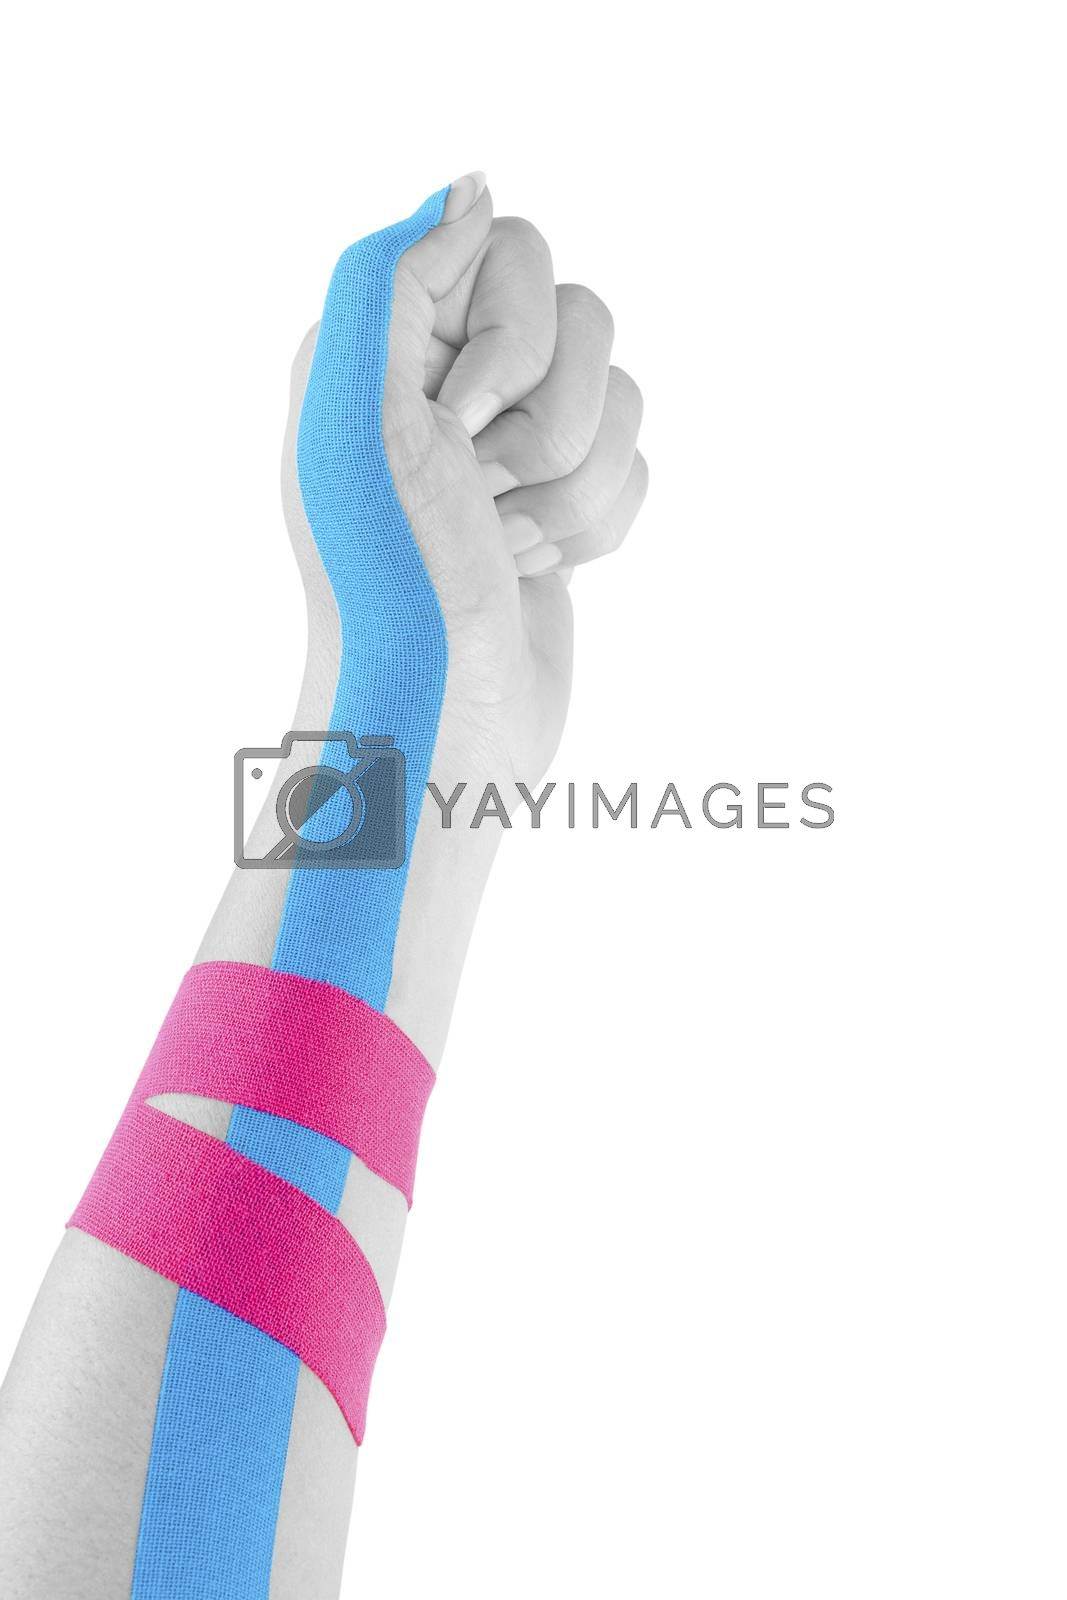 Kinesio tape on female hand. by eskymaks